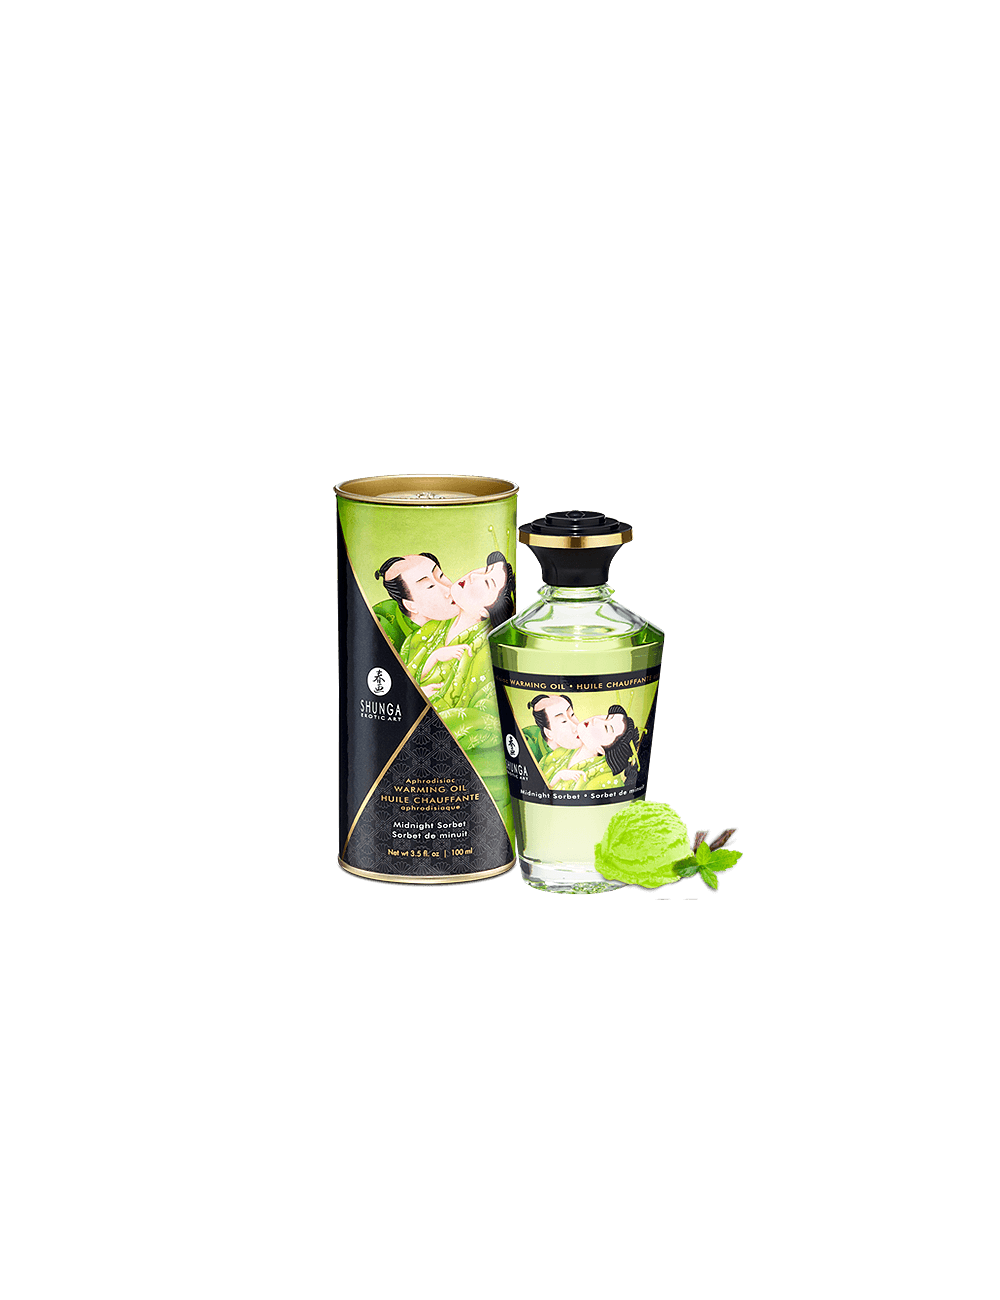 Huile chauffante aphrodisiaque - Sorbet de minuit 100ml - Huiles de massage - Shunga